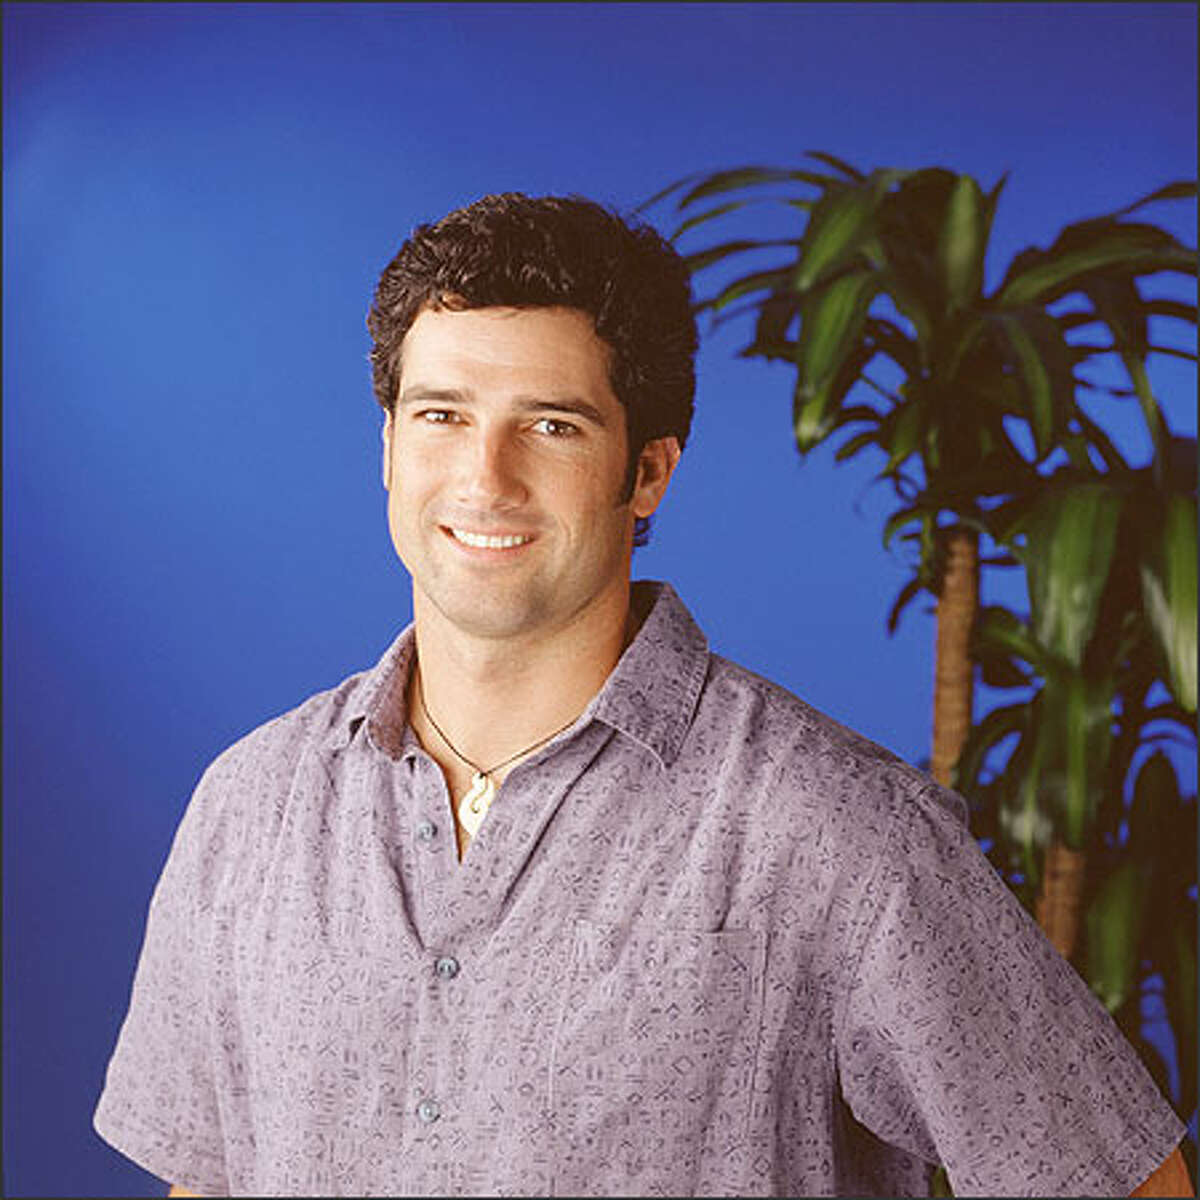 Name: Burton Roberts Occupation:Marketing Executive Age: 31 Hometown:San Francisco